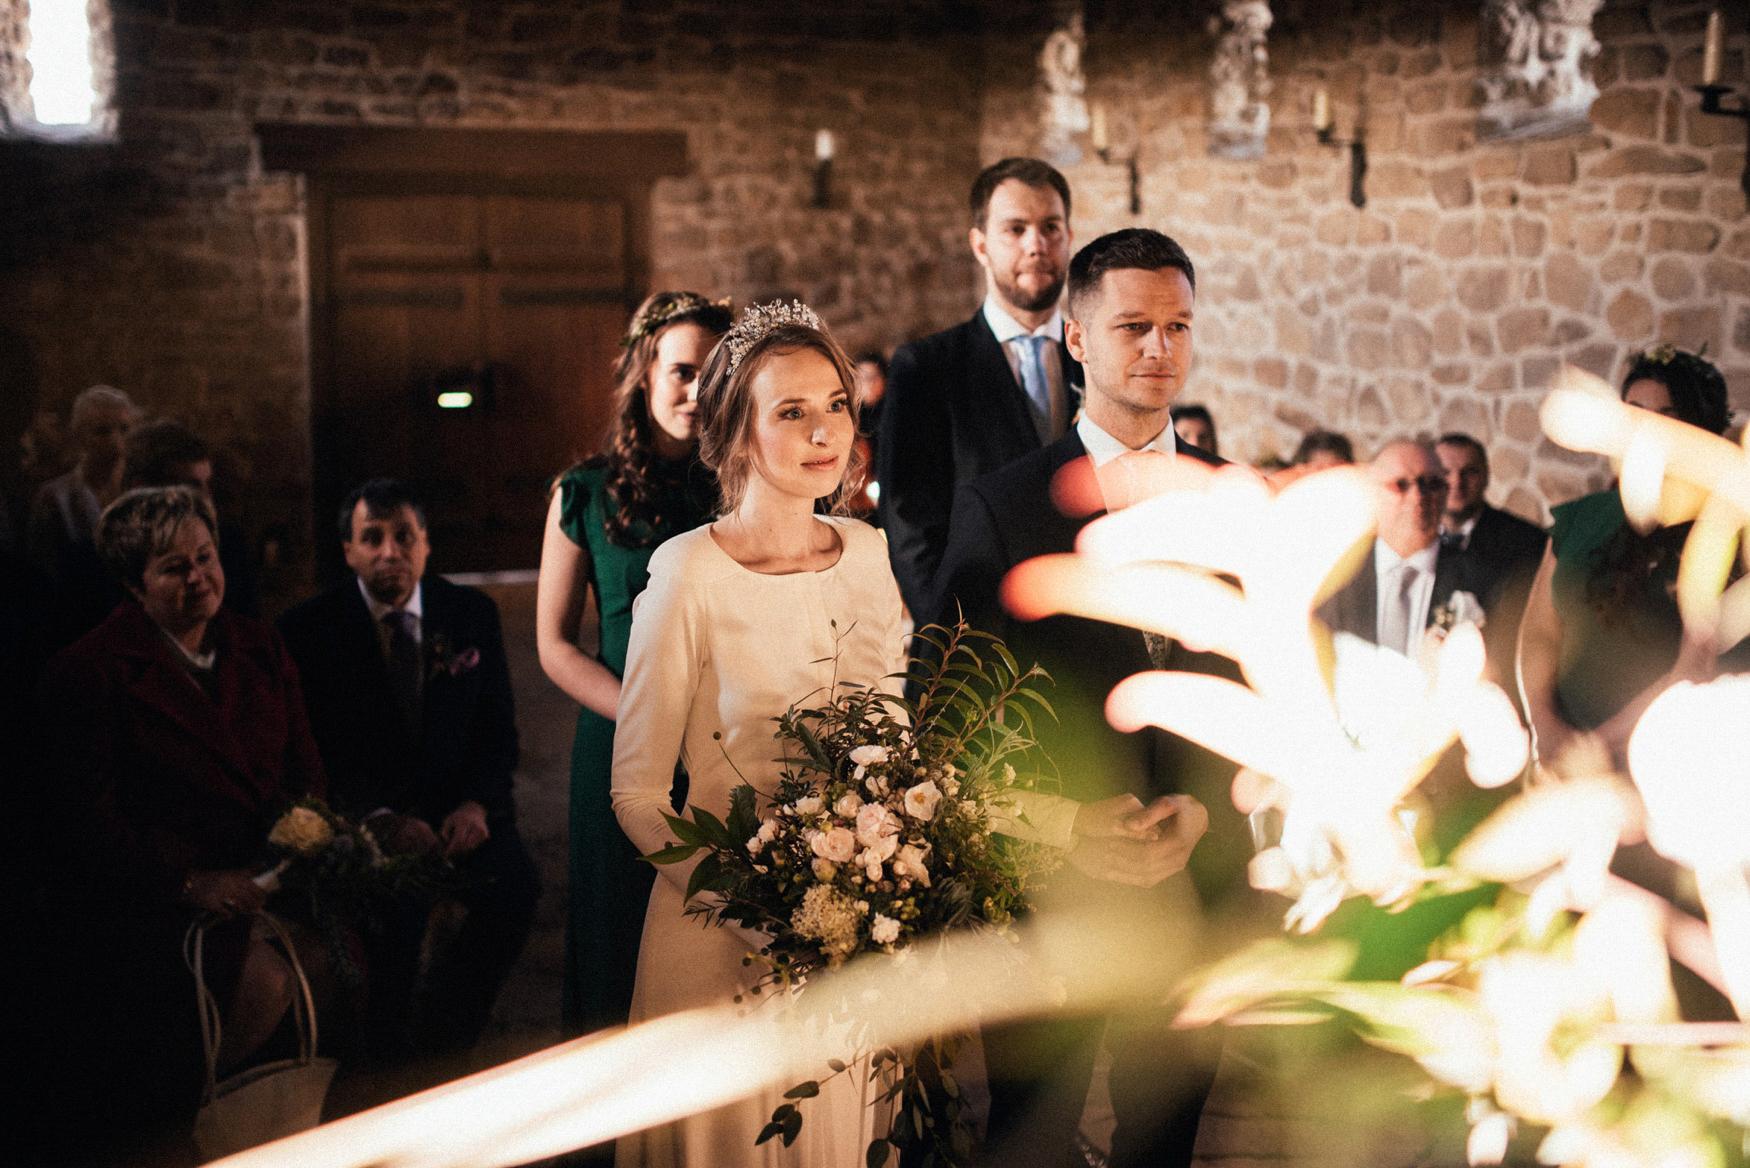 2 prague wedding photographer - boho svatba zikmundov017.jpg